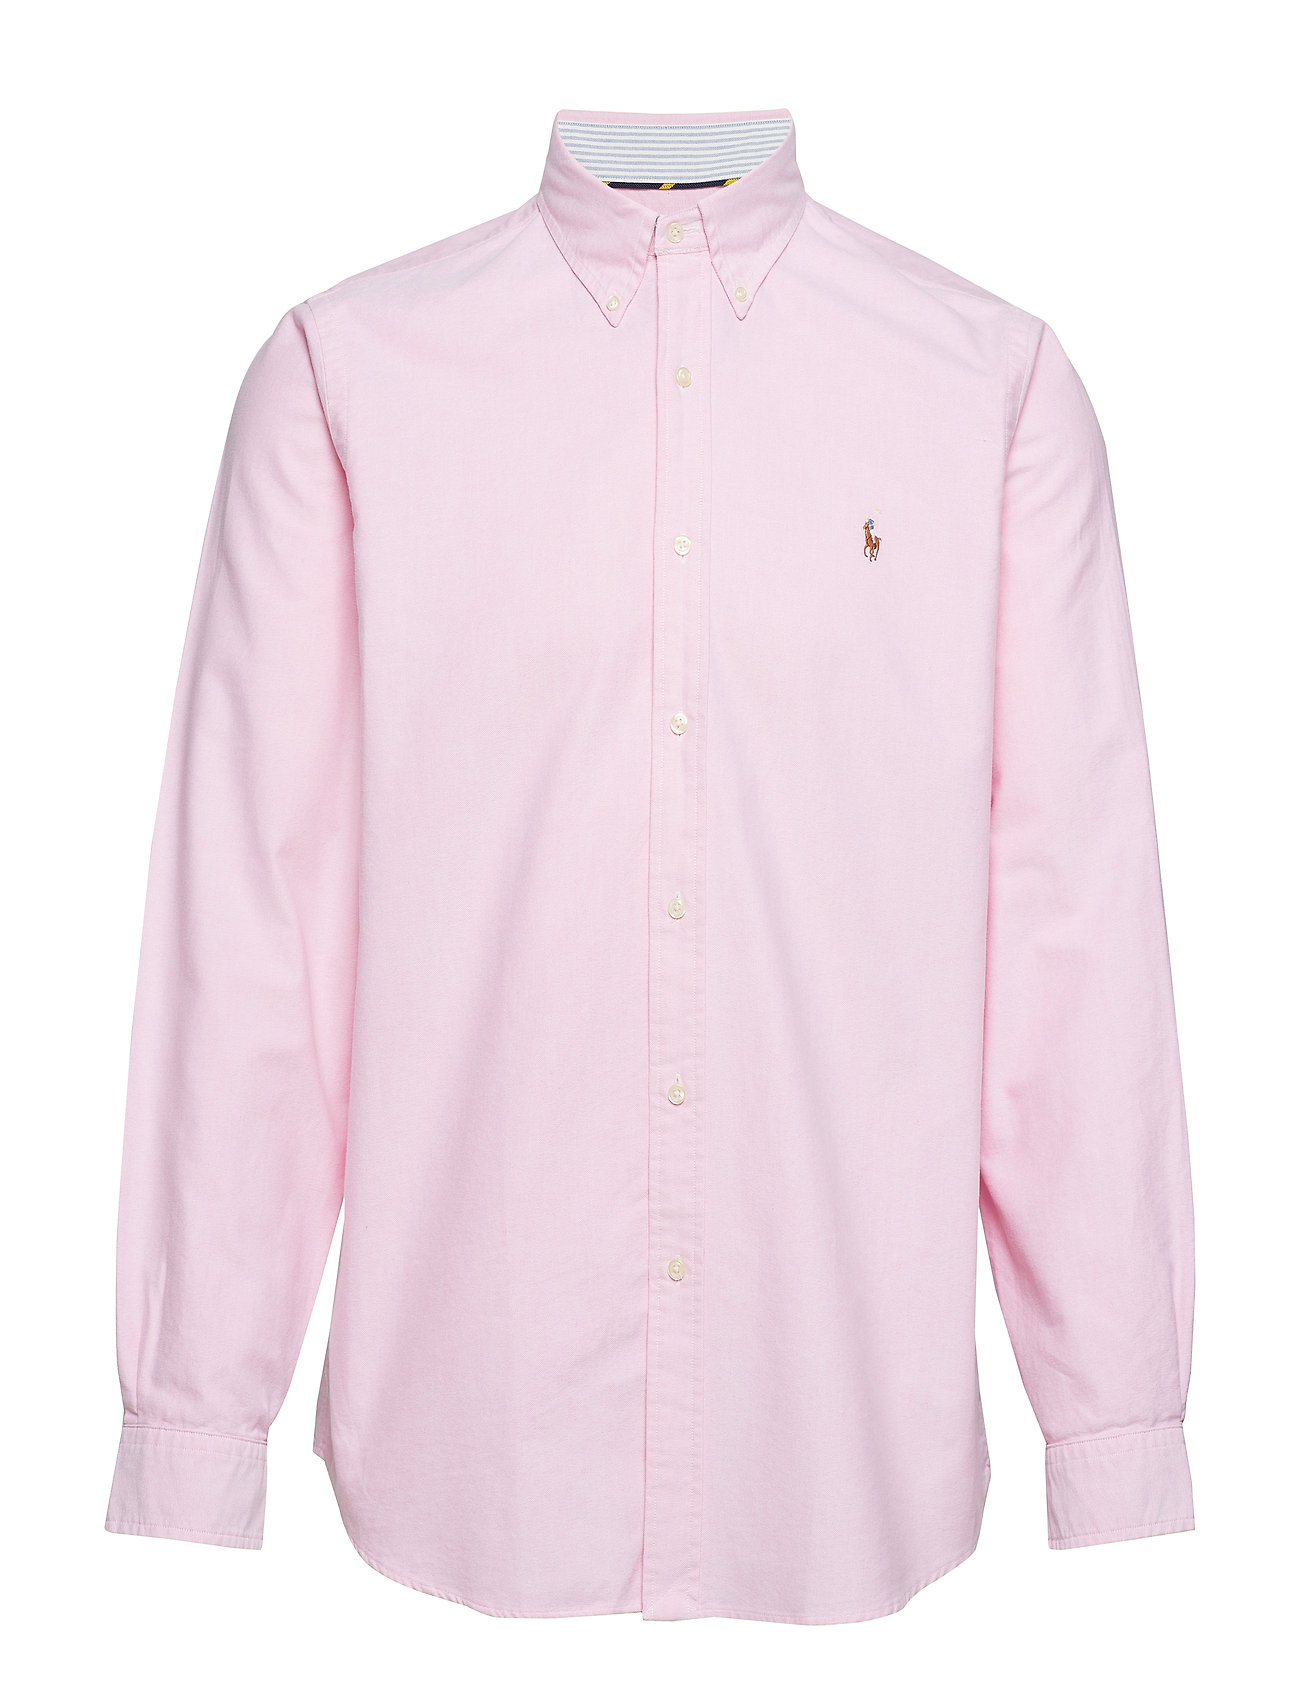 Long Sleeve Shirt (New Rose) (£51) - Polo Ralph Lauren - Shirts ... 0b116403f0b